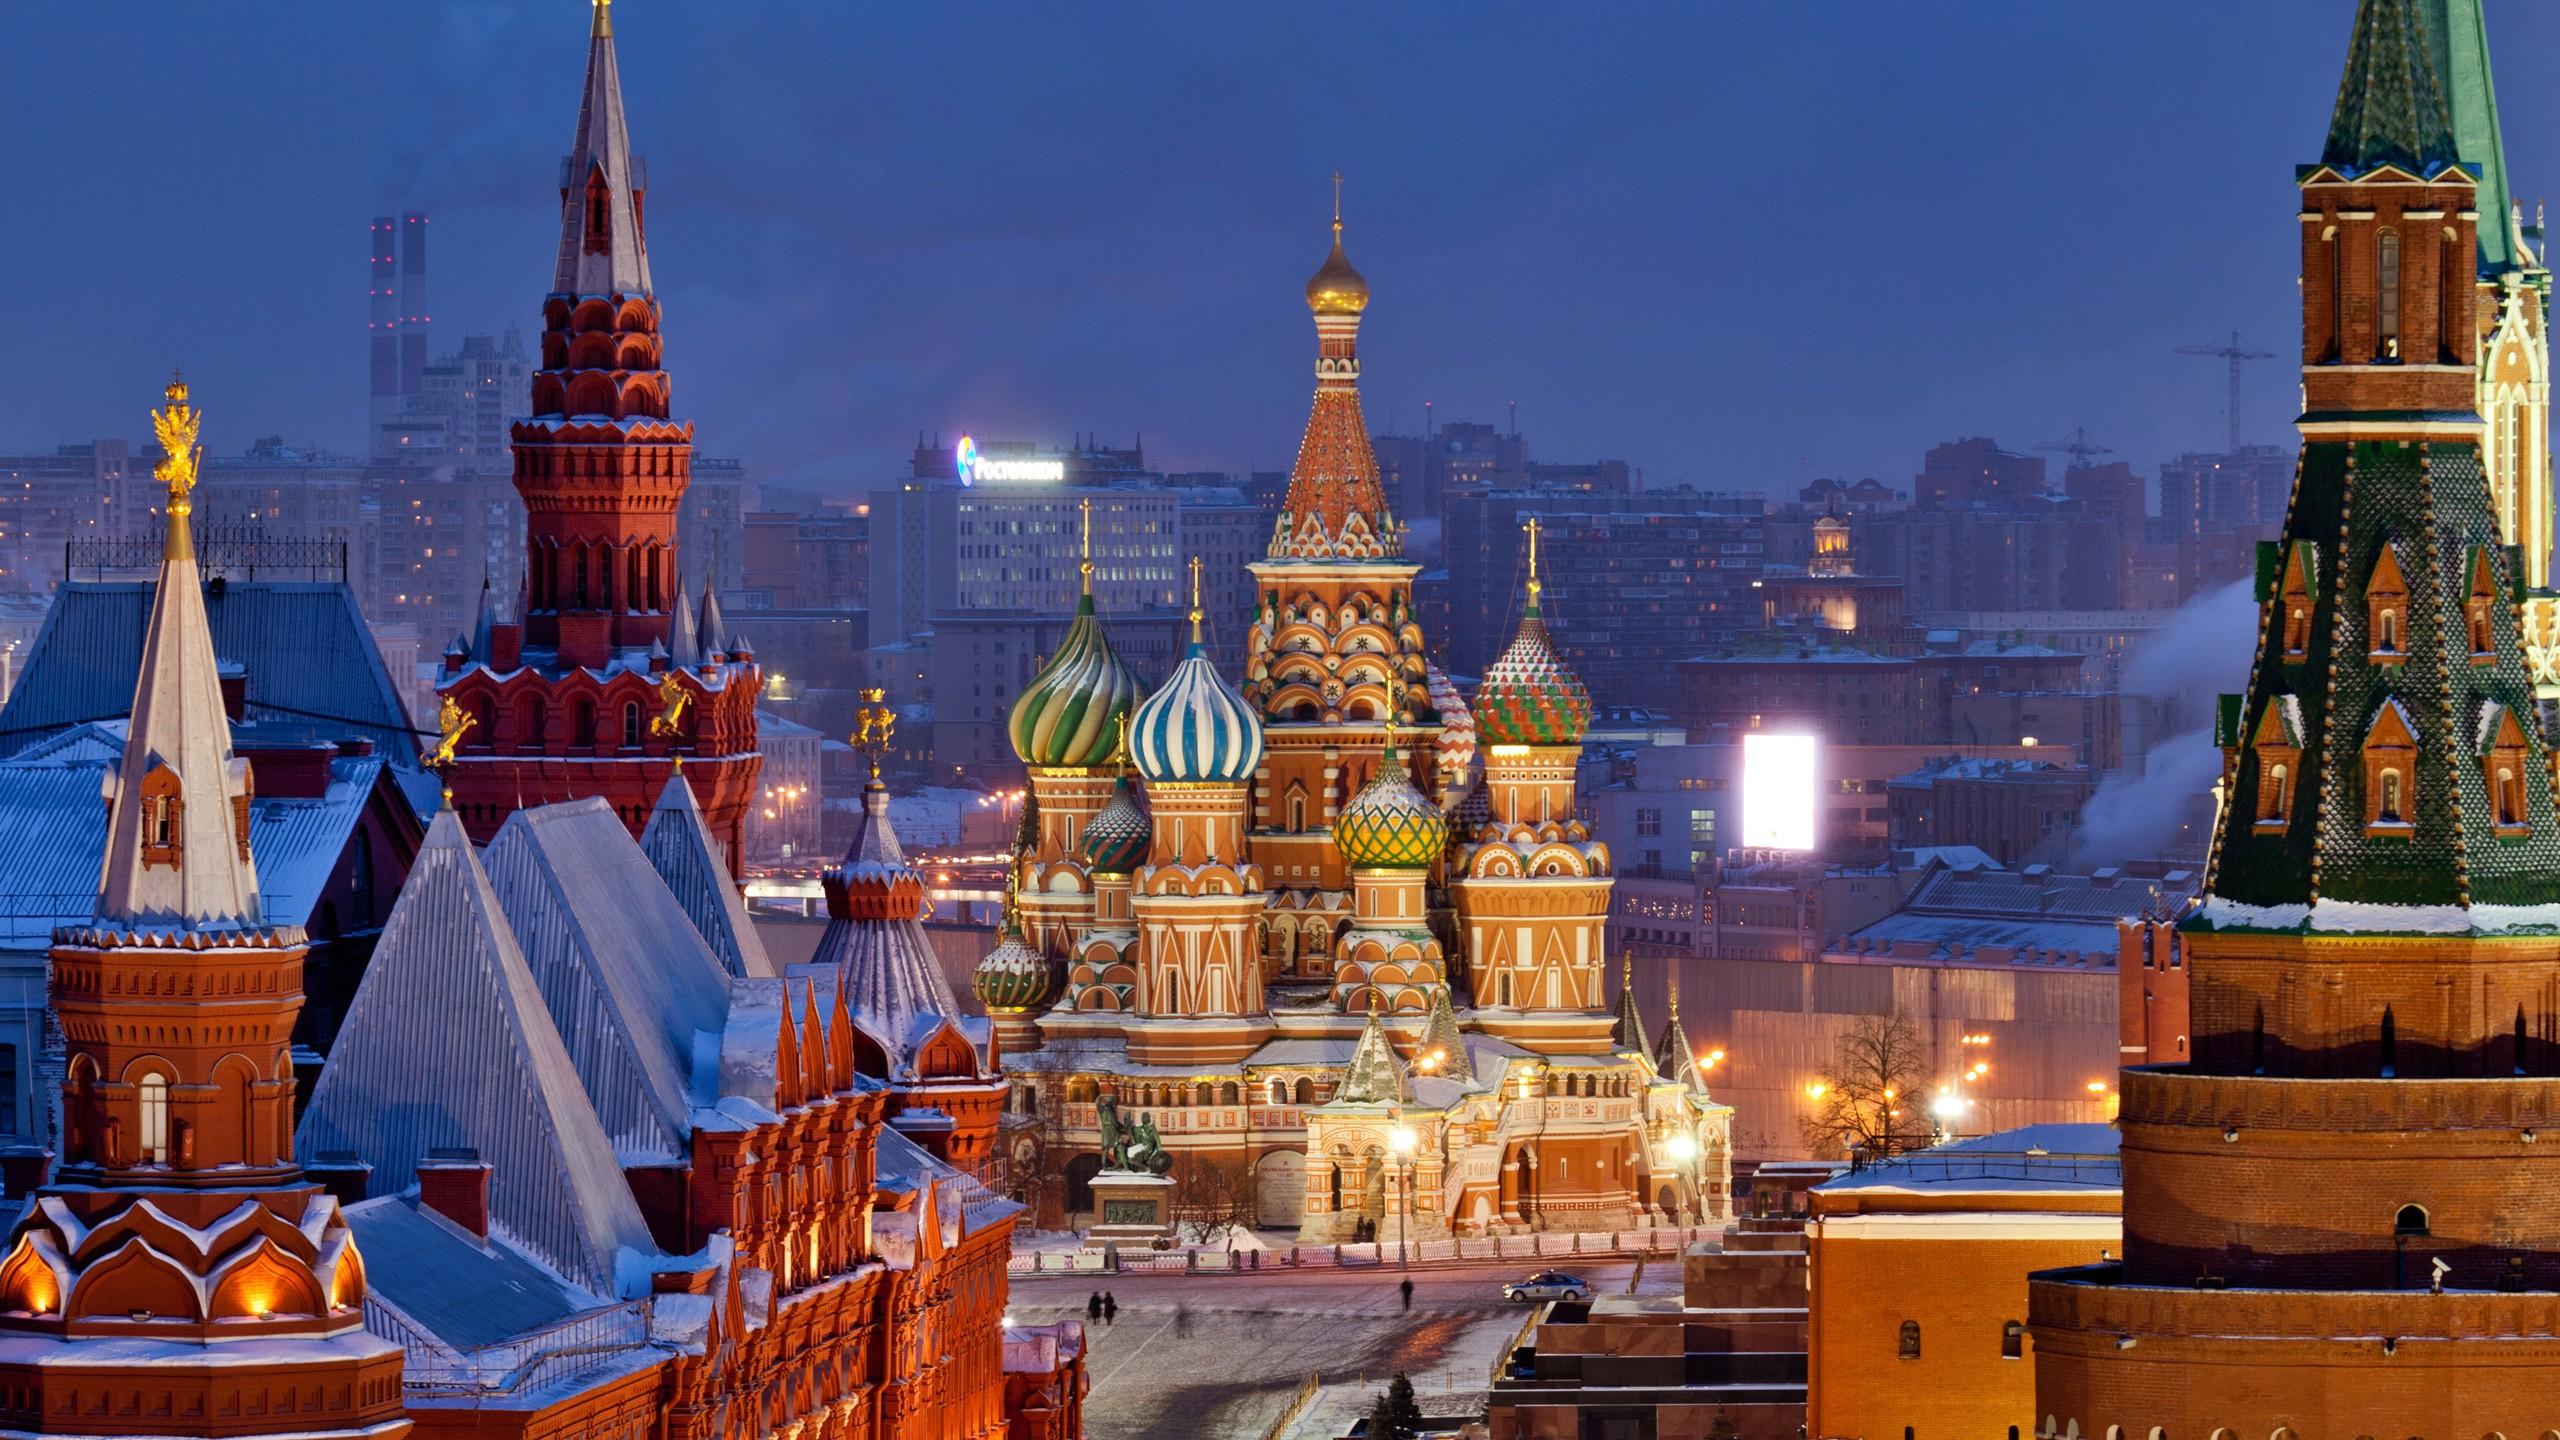 картинка кремль москва